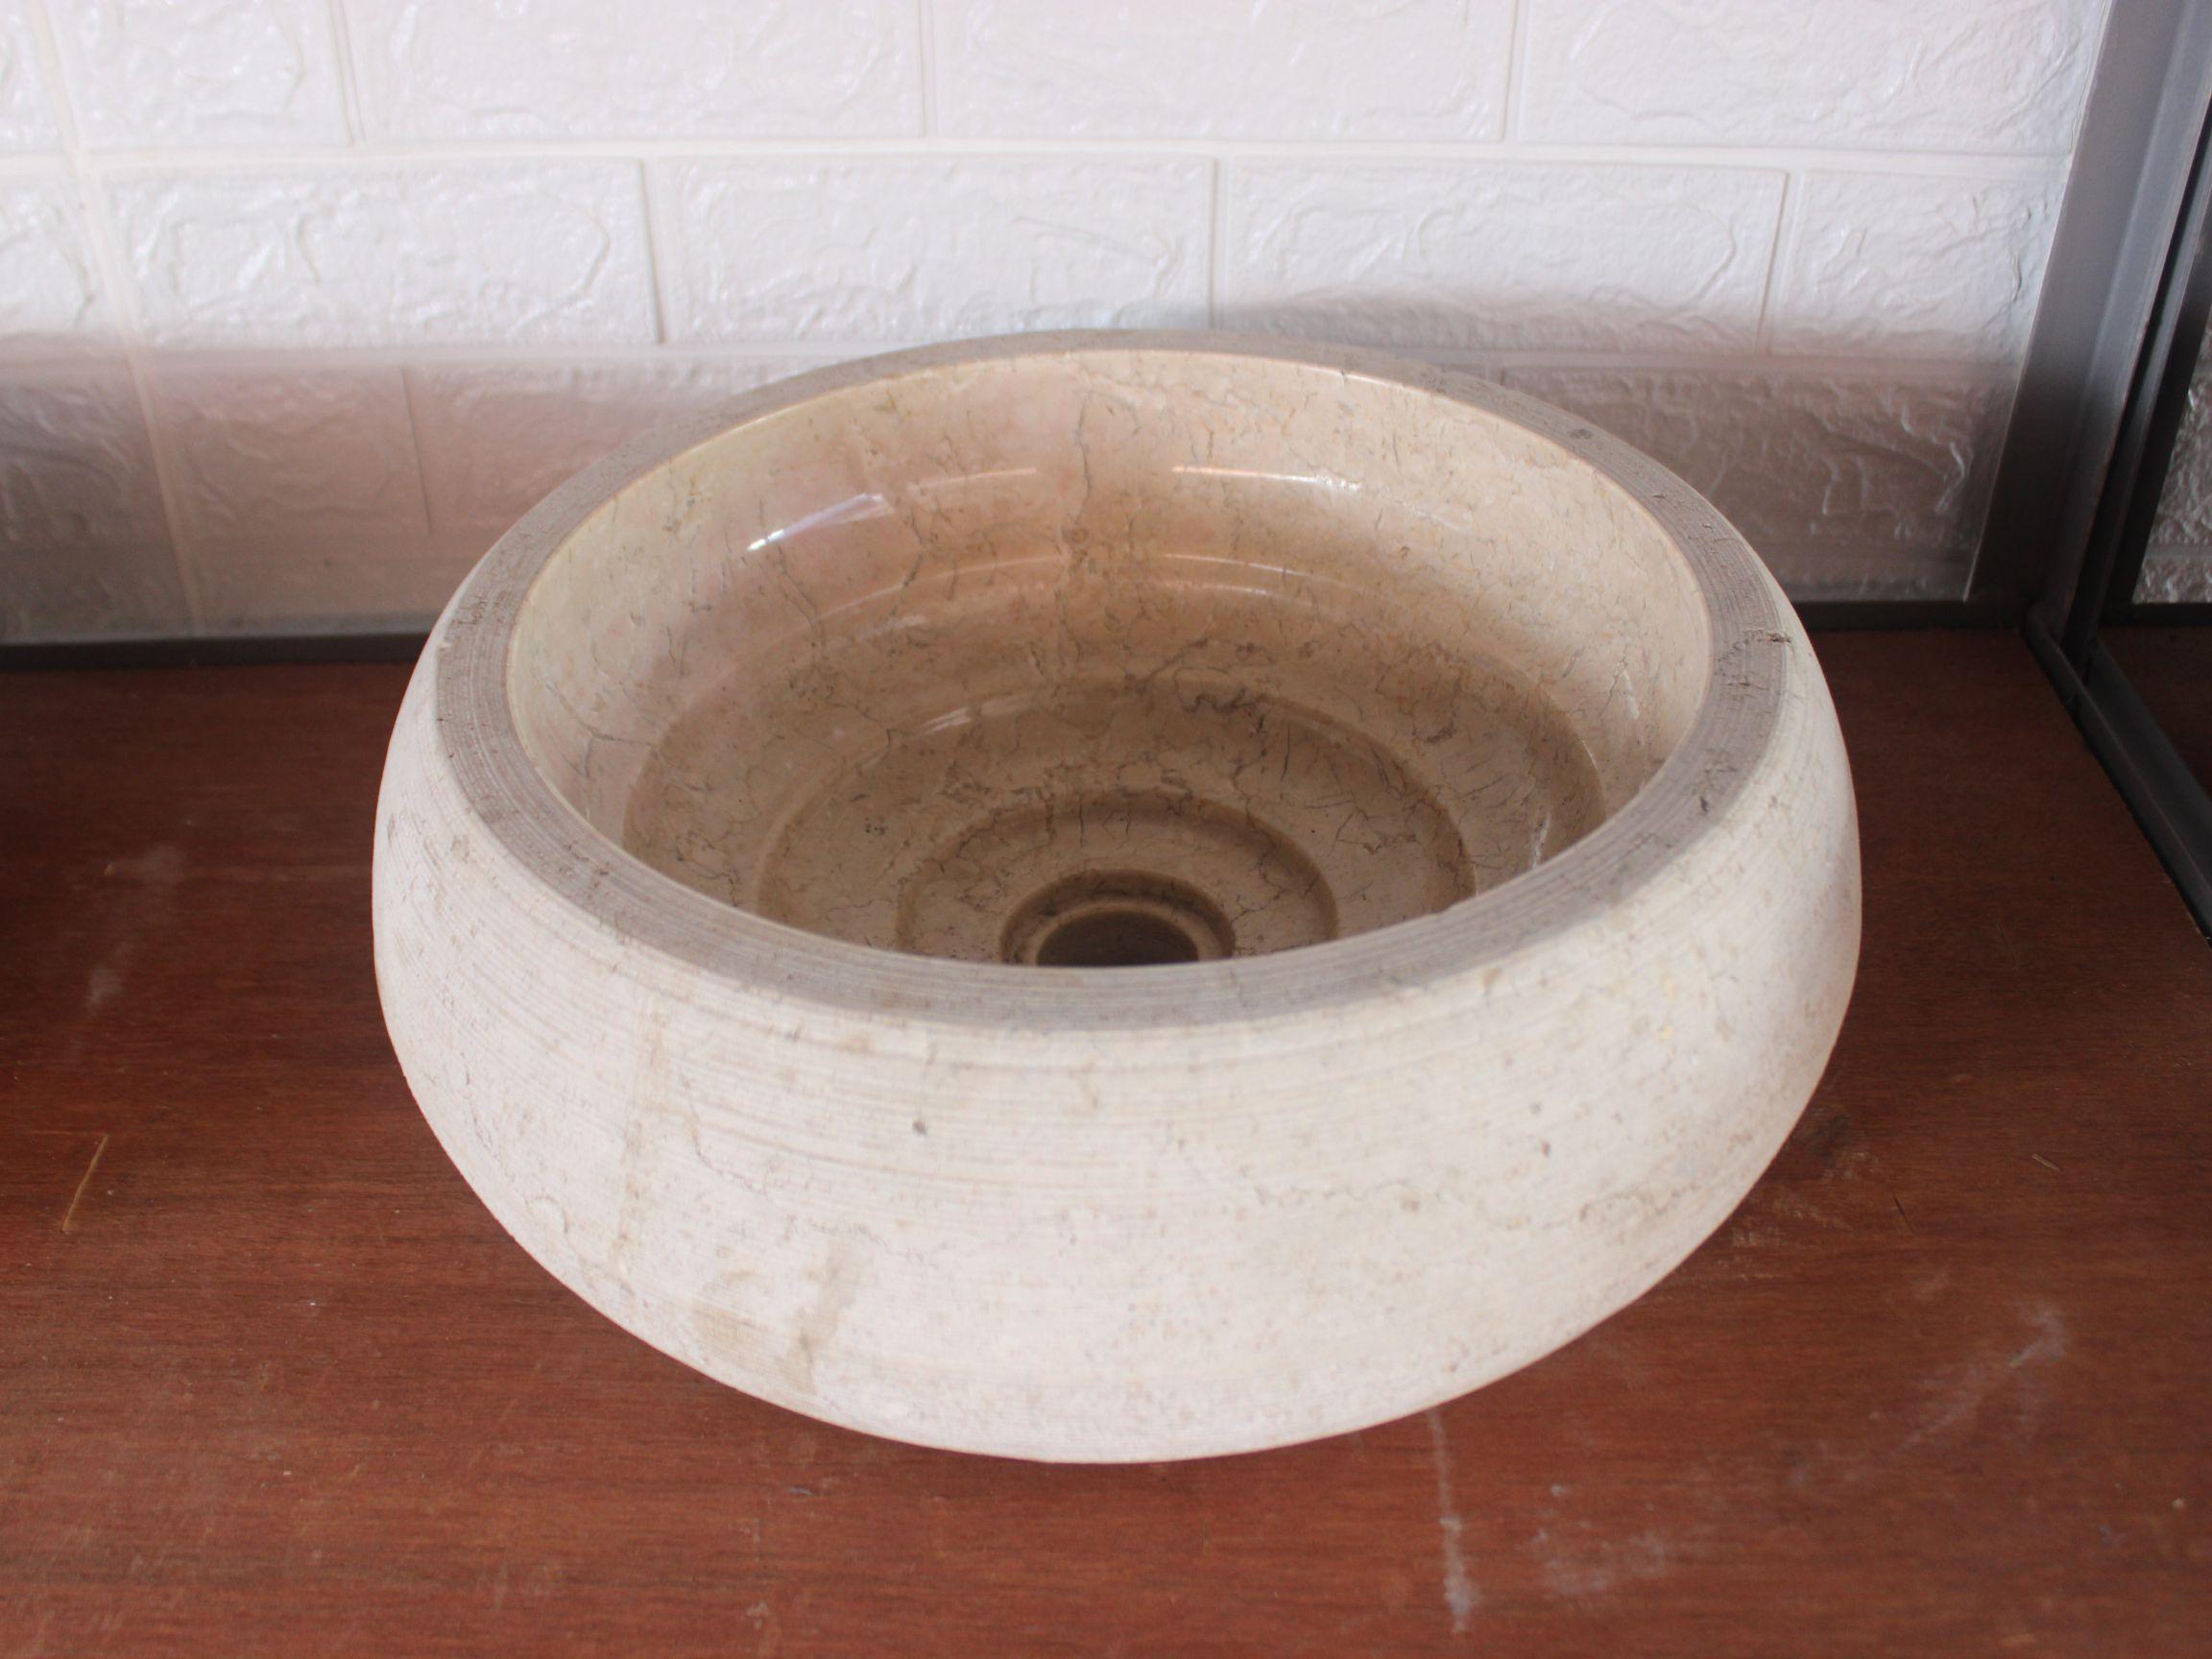 Wastafel Unik Batu Alam Promo di Tulungagung/ Tempat Cuci Tangan